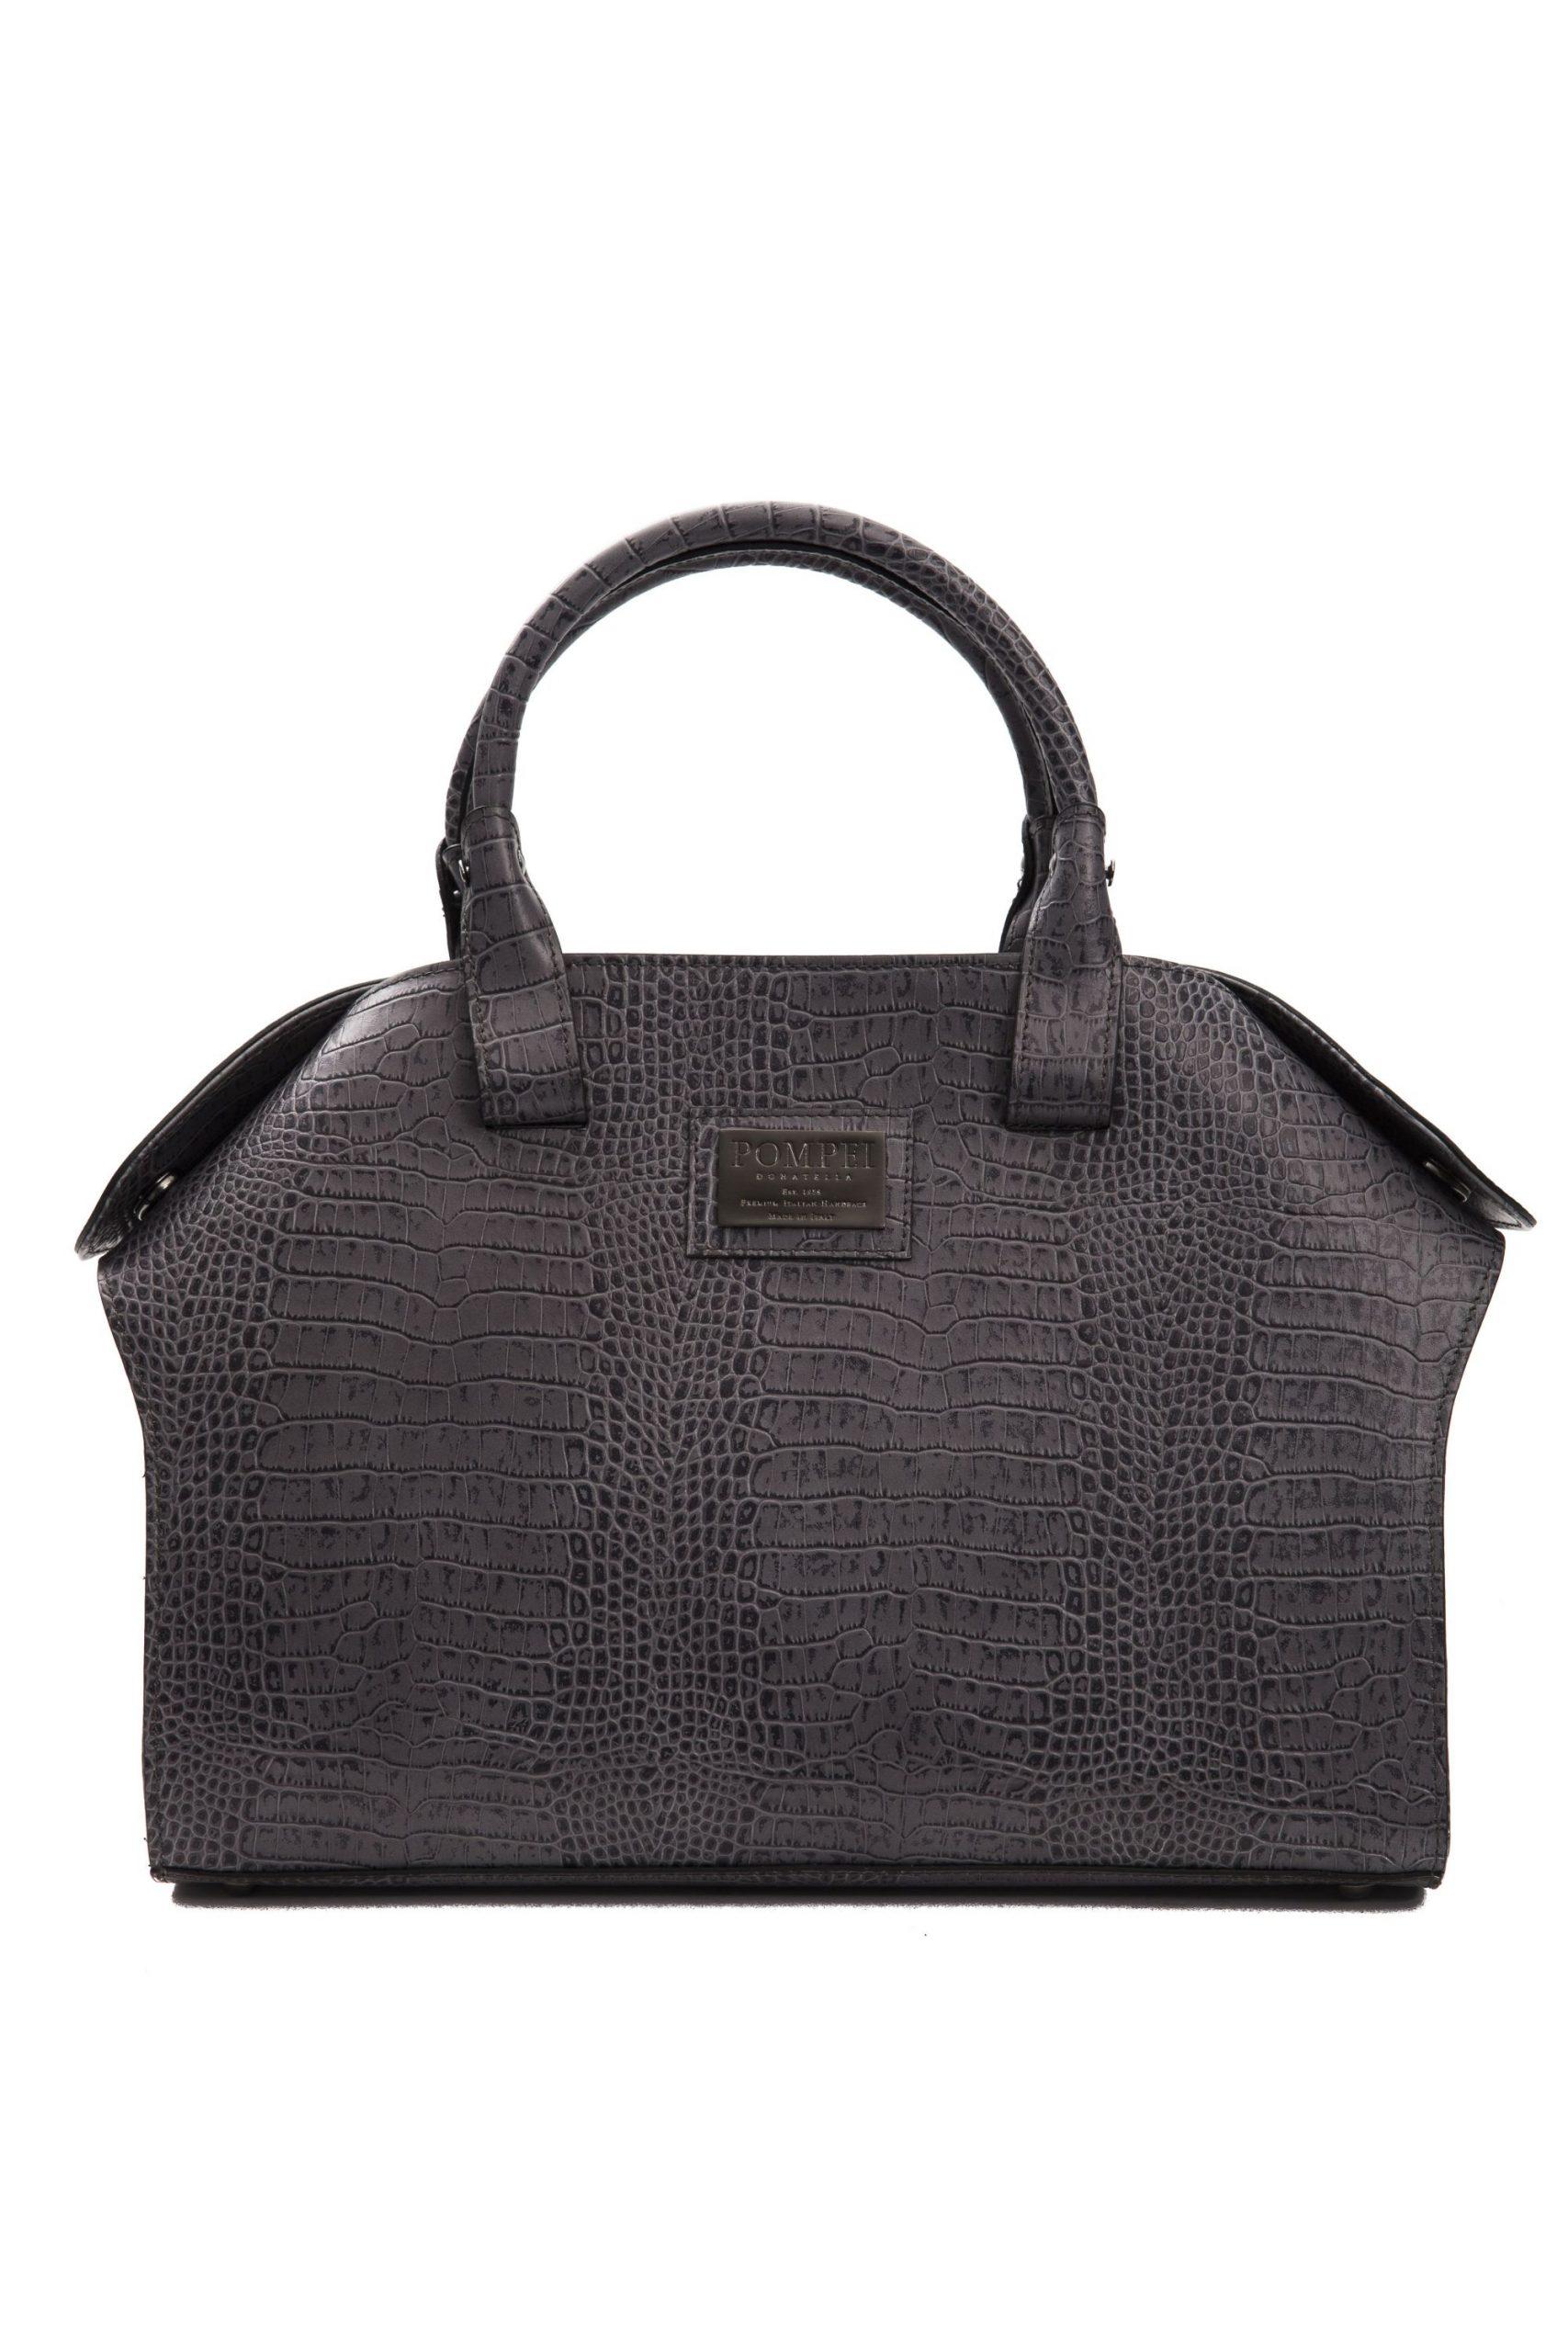 Pompei Donatella Women's Handbag Grey PO667714